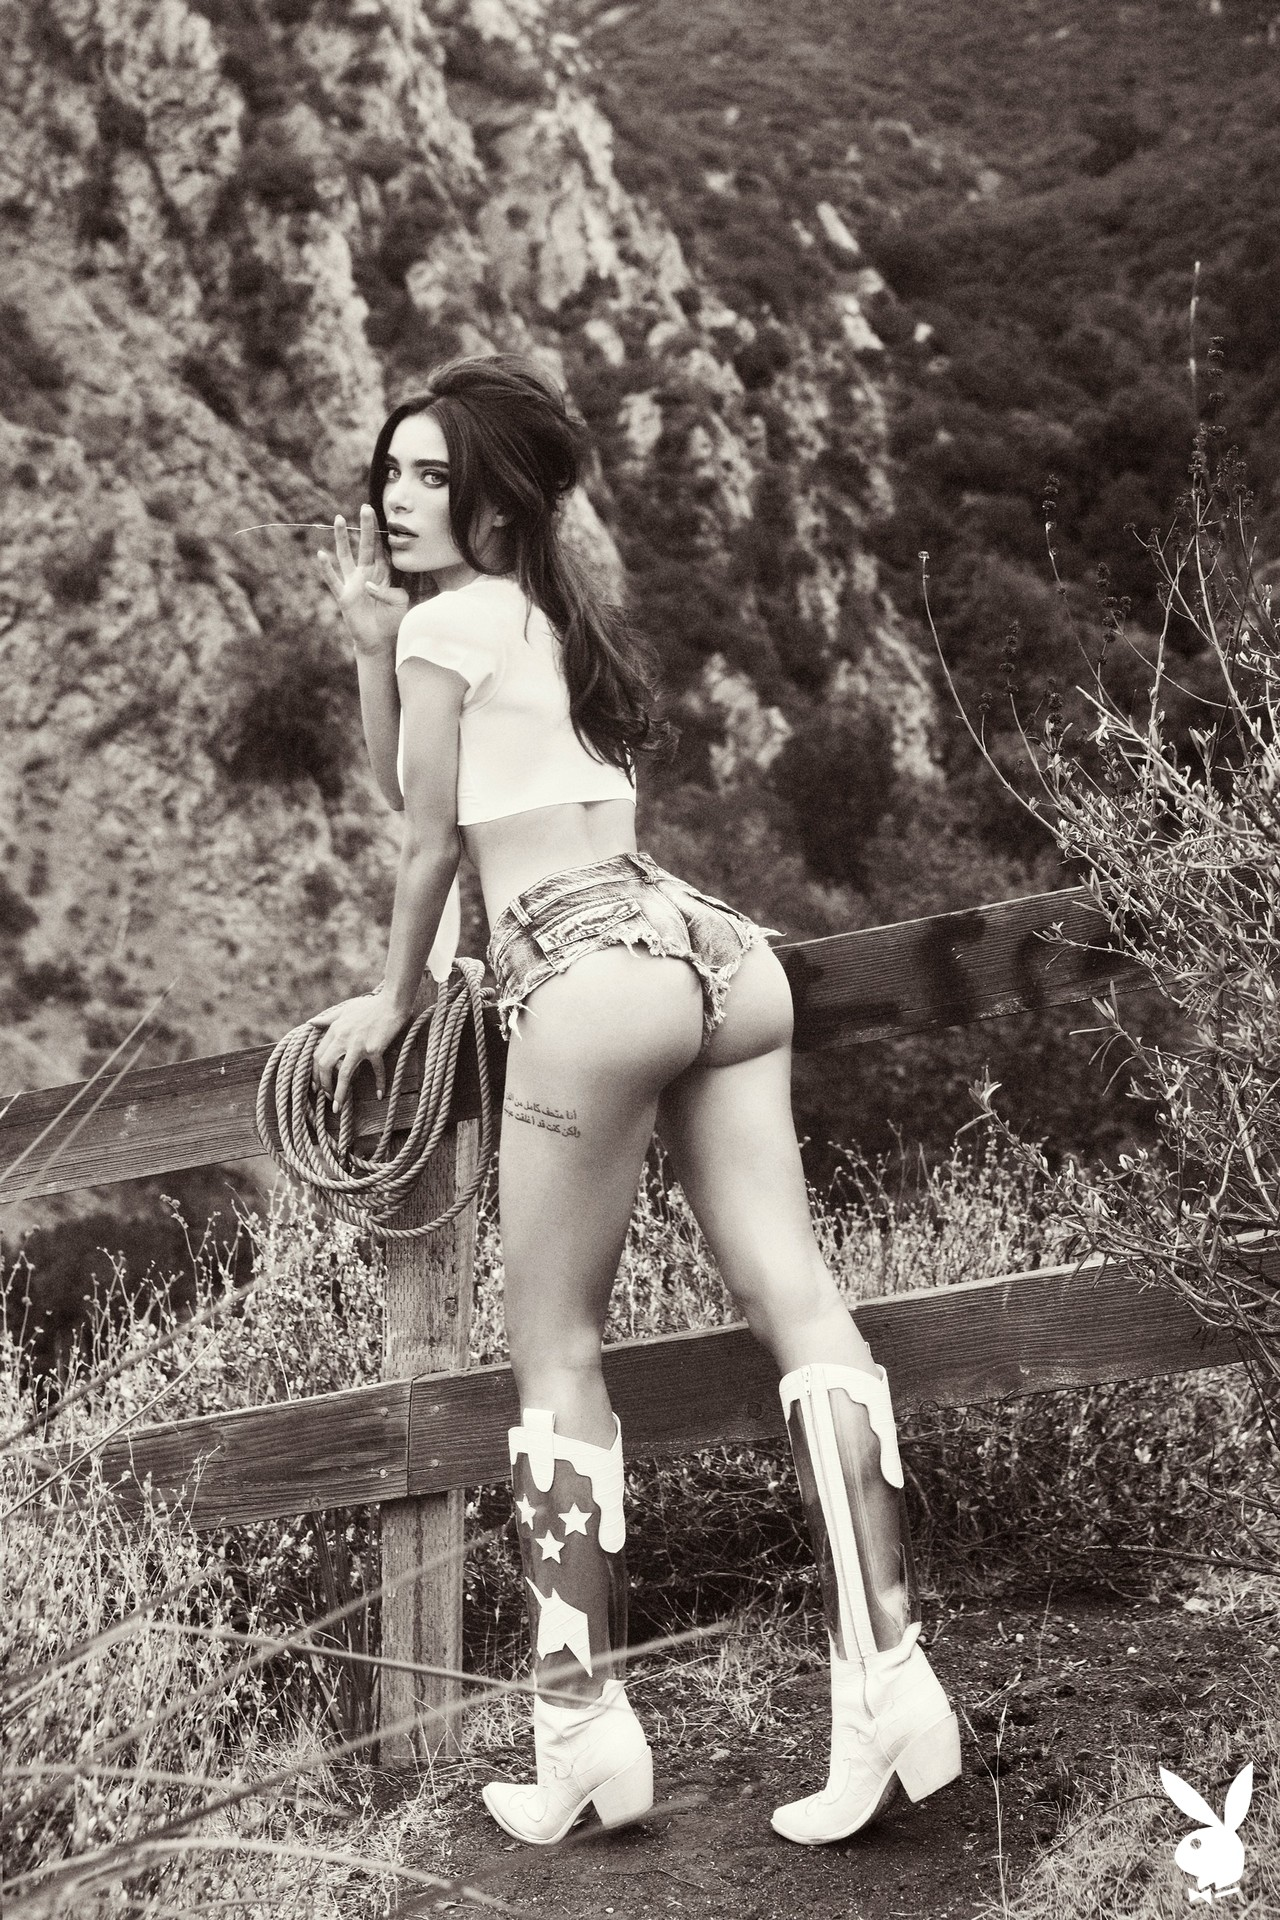 The Road To Lana Rhoades Playboy Plus (1)